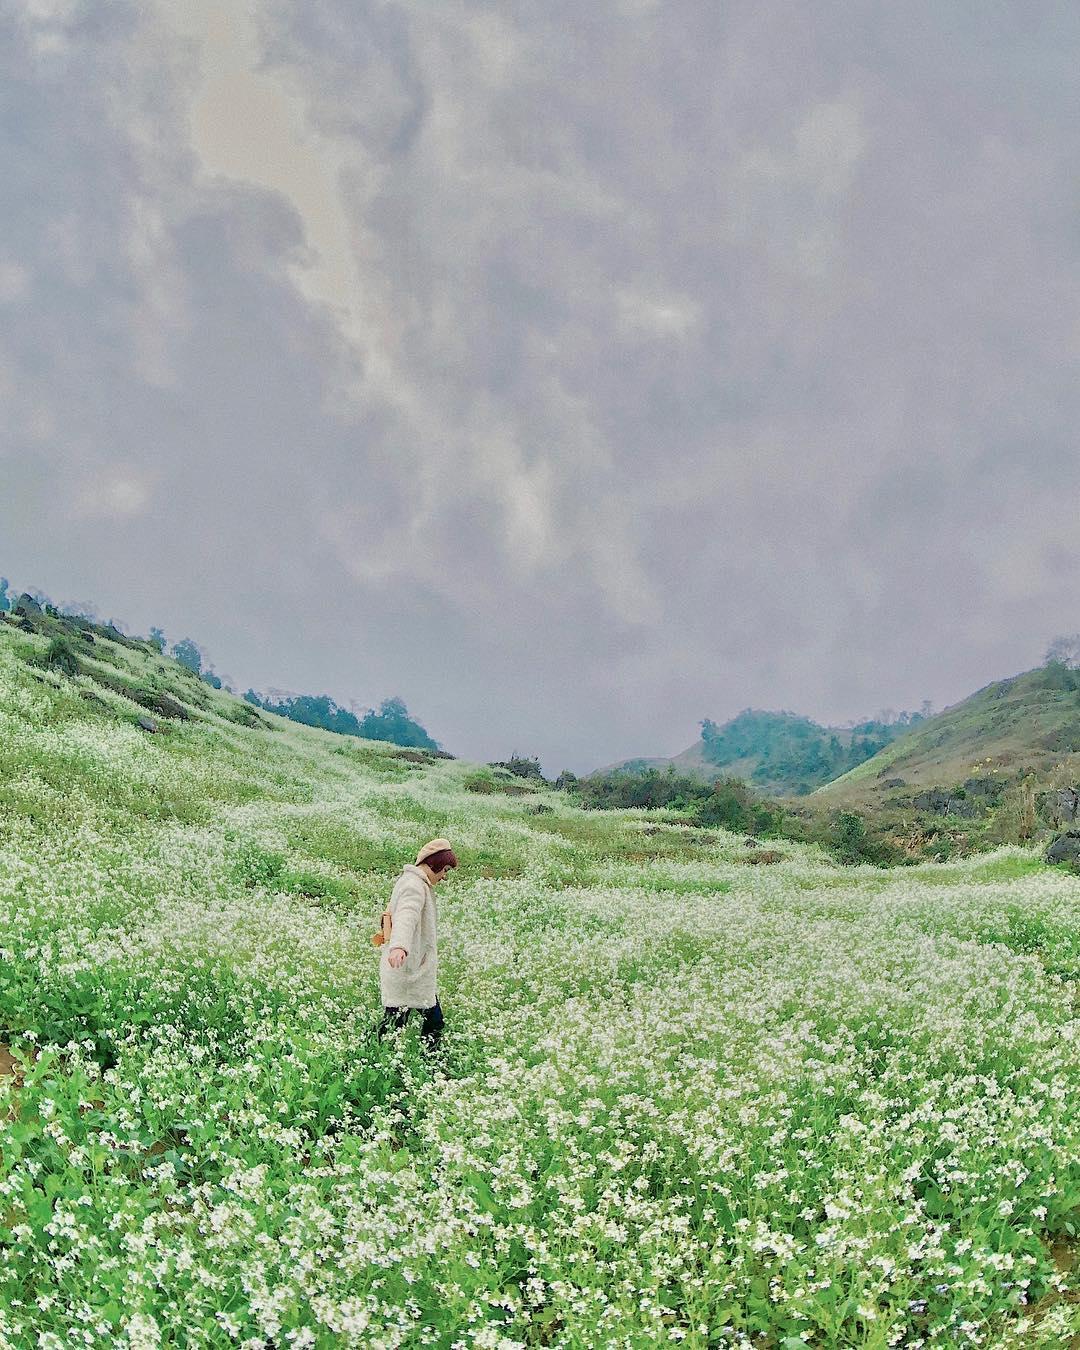 mocchau_diem-san-hoa-cai-trang-moc-chau-4